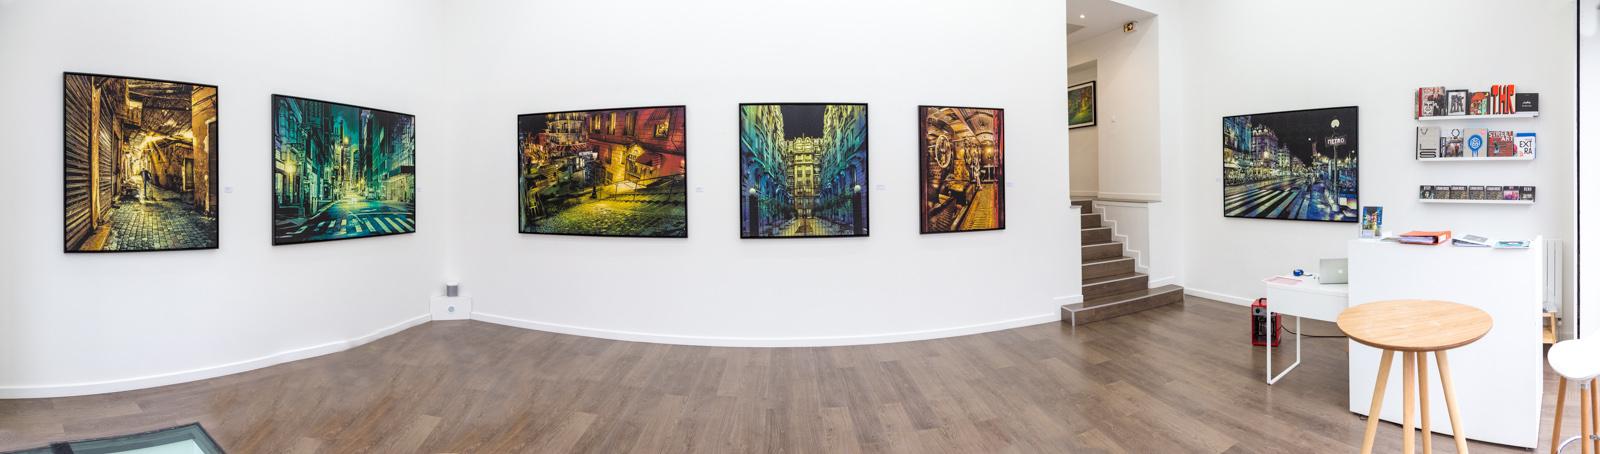 Logan Hicks - Galerie Openspace